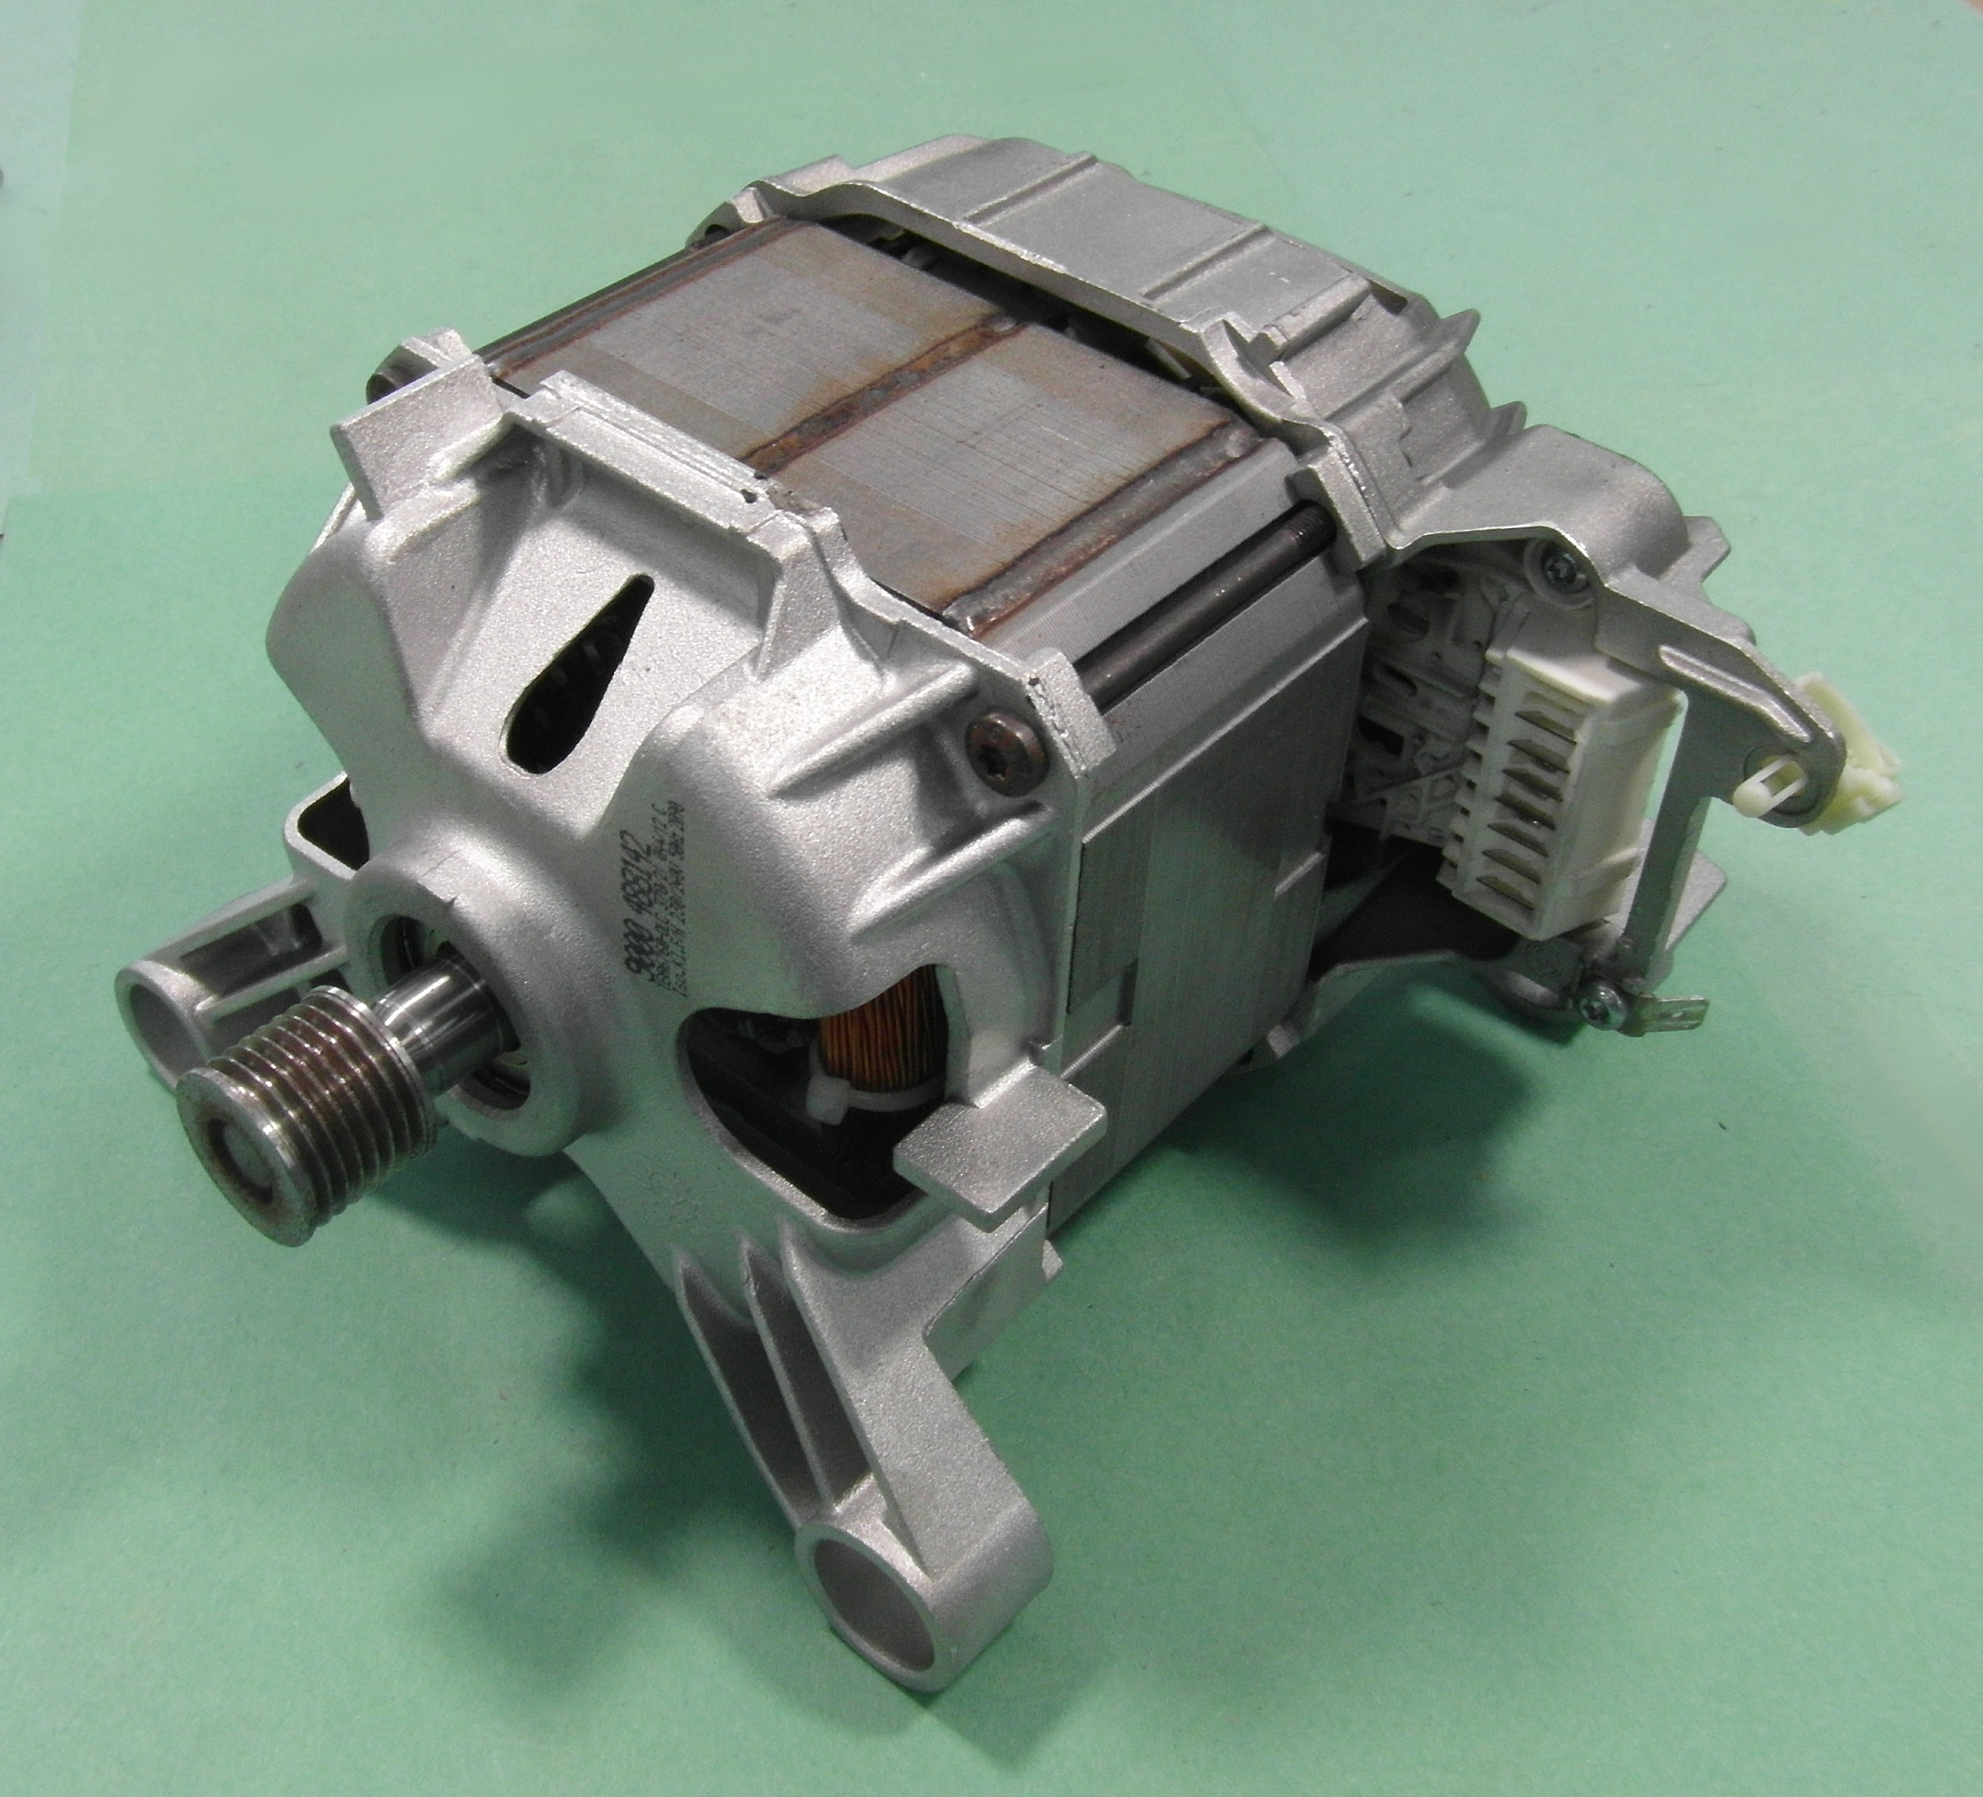 Bosch waq28460gb 06 washing machine motor 9000488142 151 for Motor for bosch washing machine